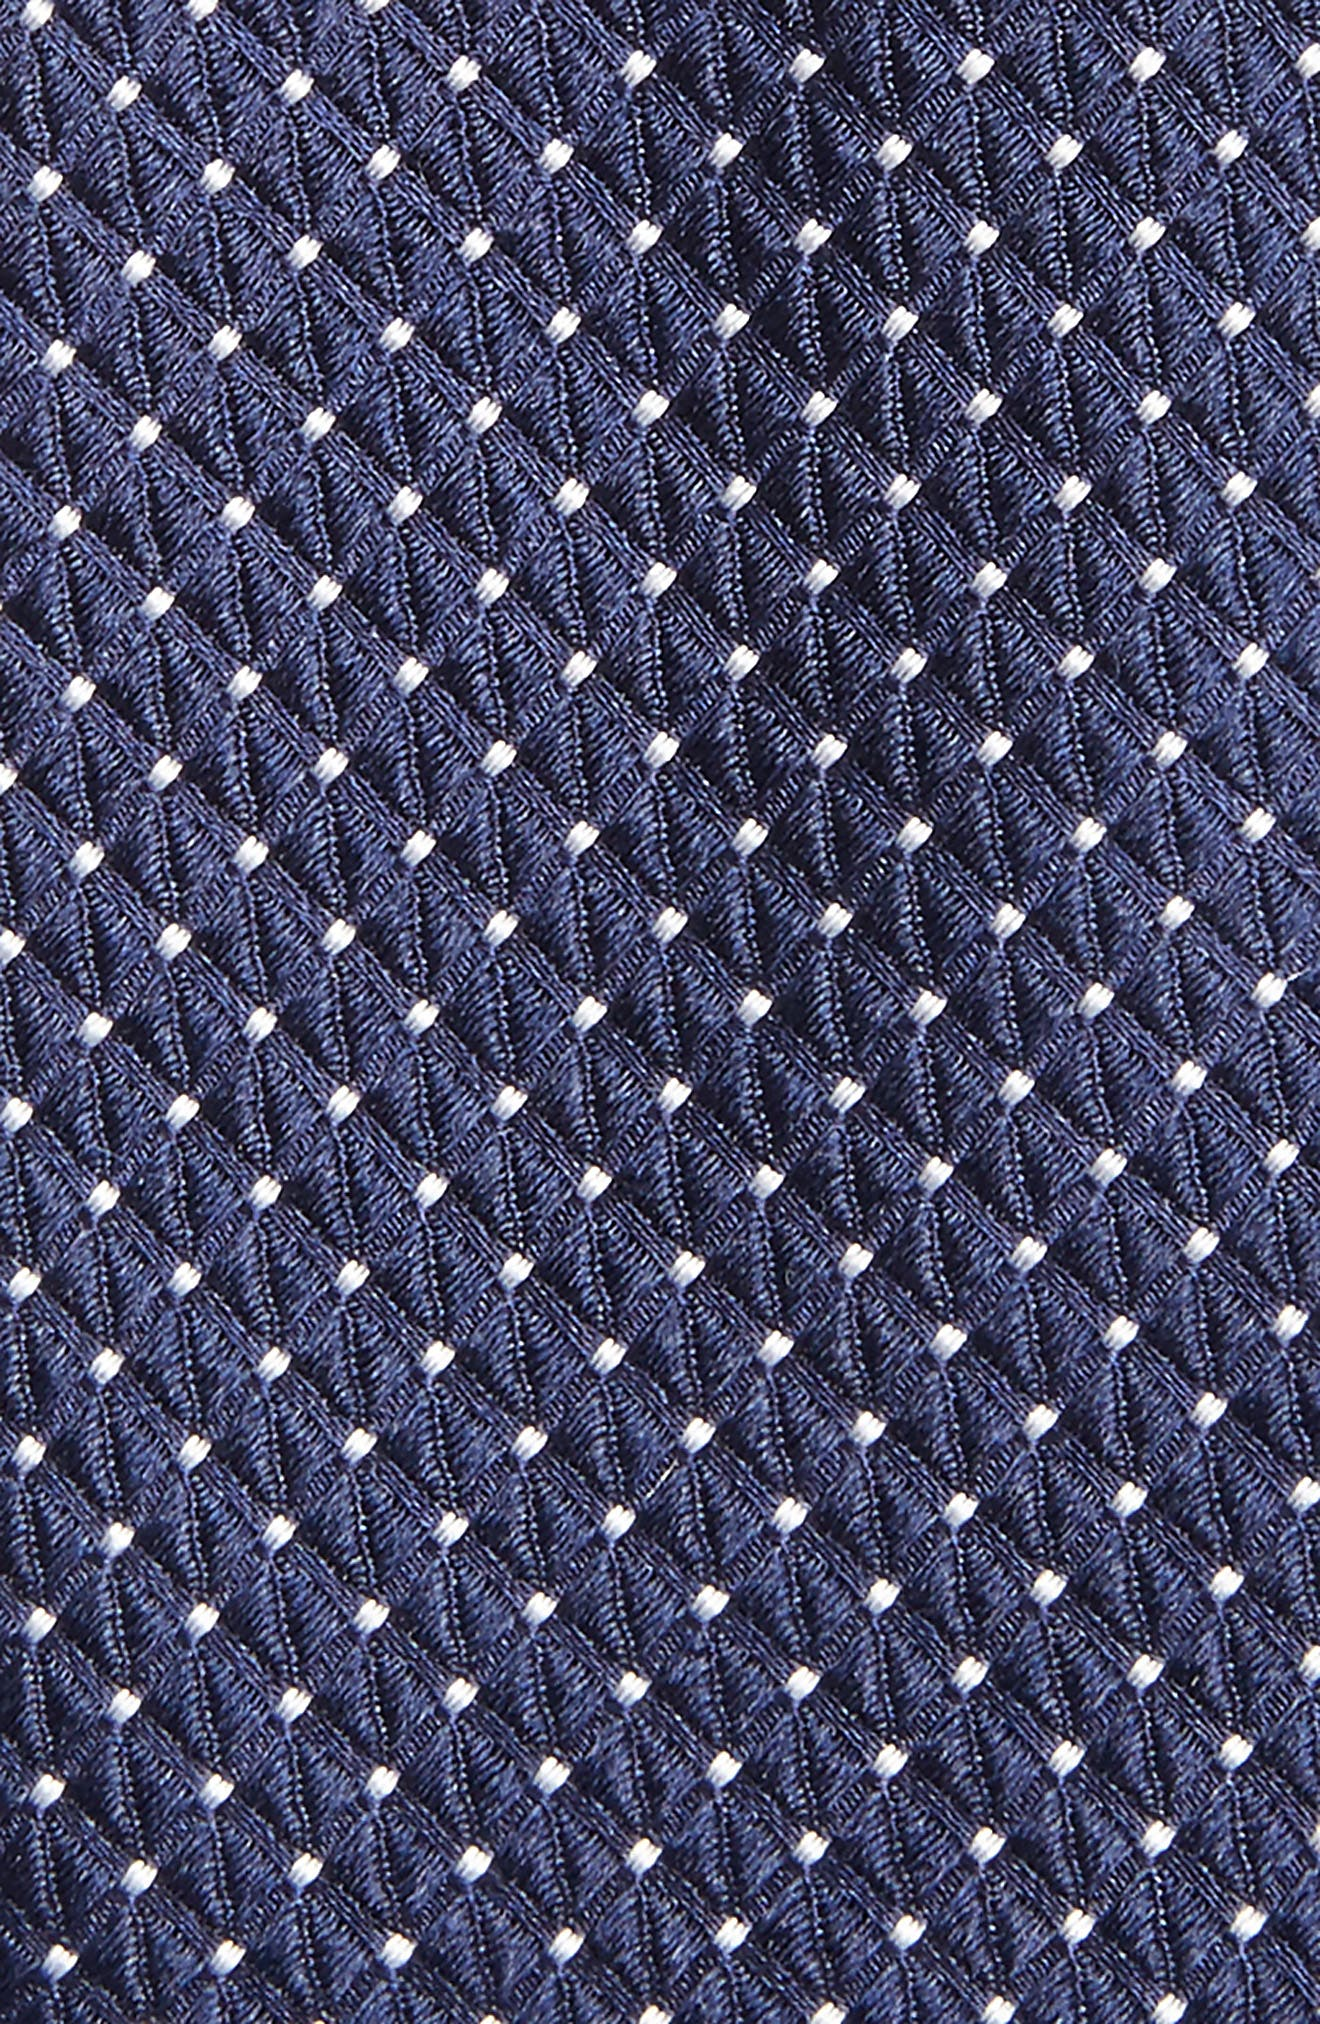 Alternate Image 2  - Nordstrom Men's Shop Hammond Neat Silk Tie